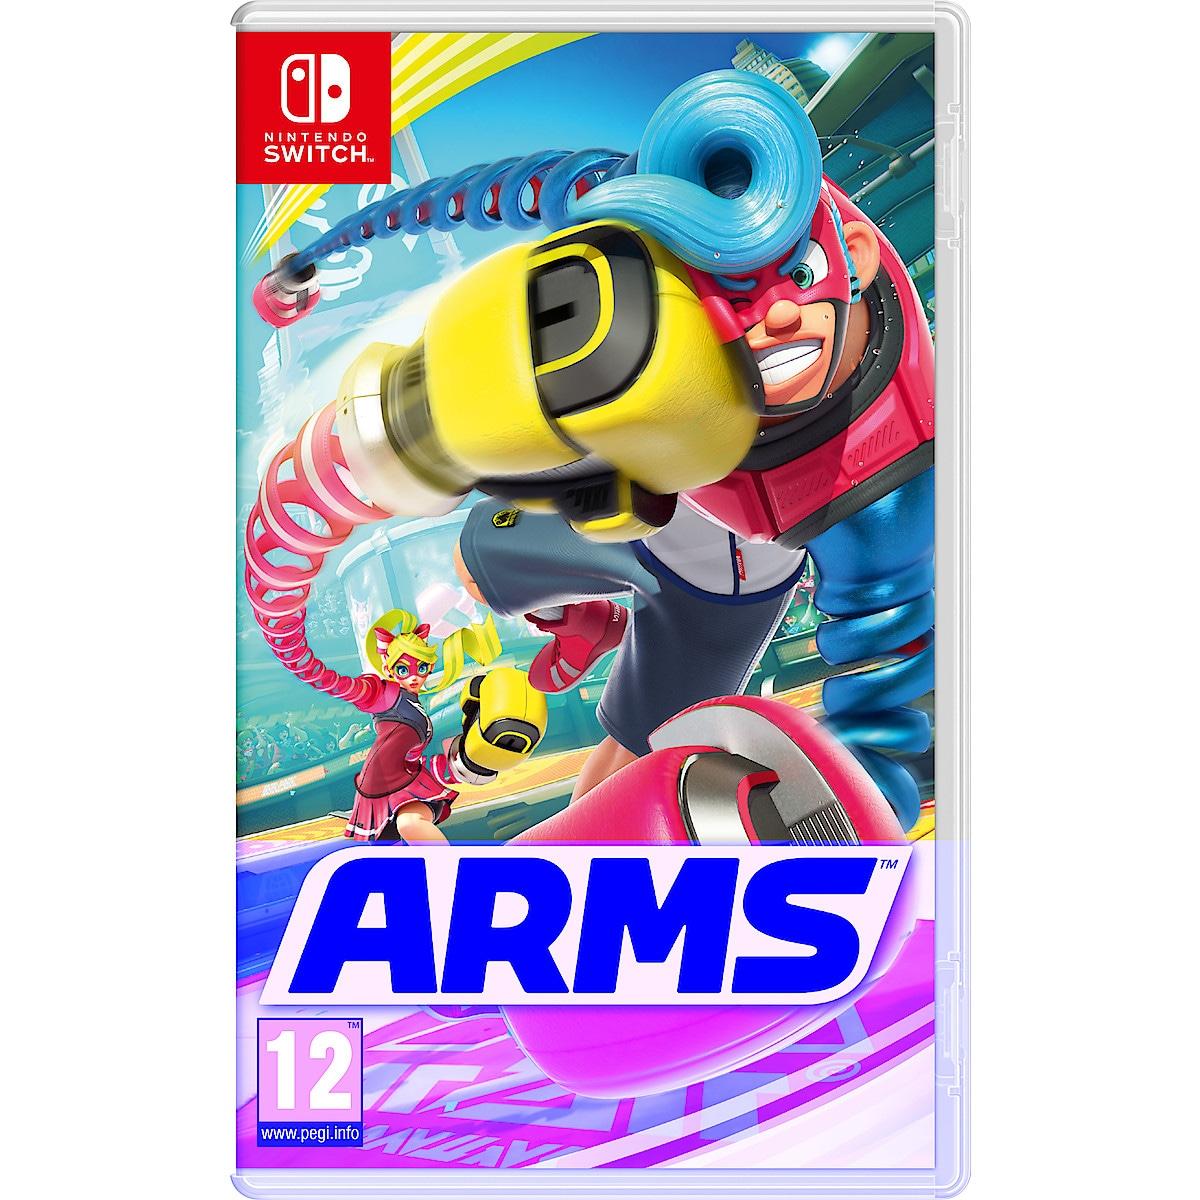 Arms spel till Nintendo Switch